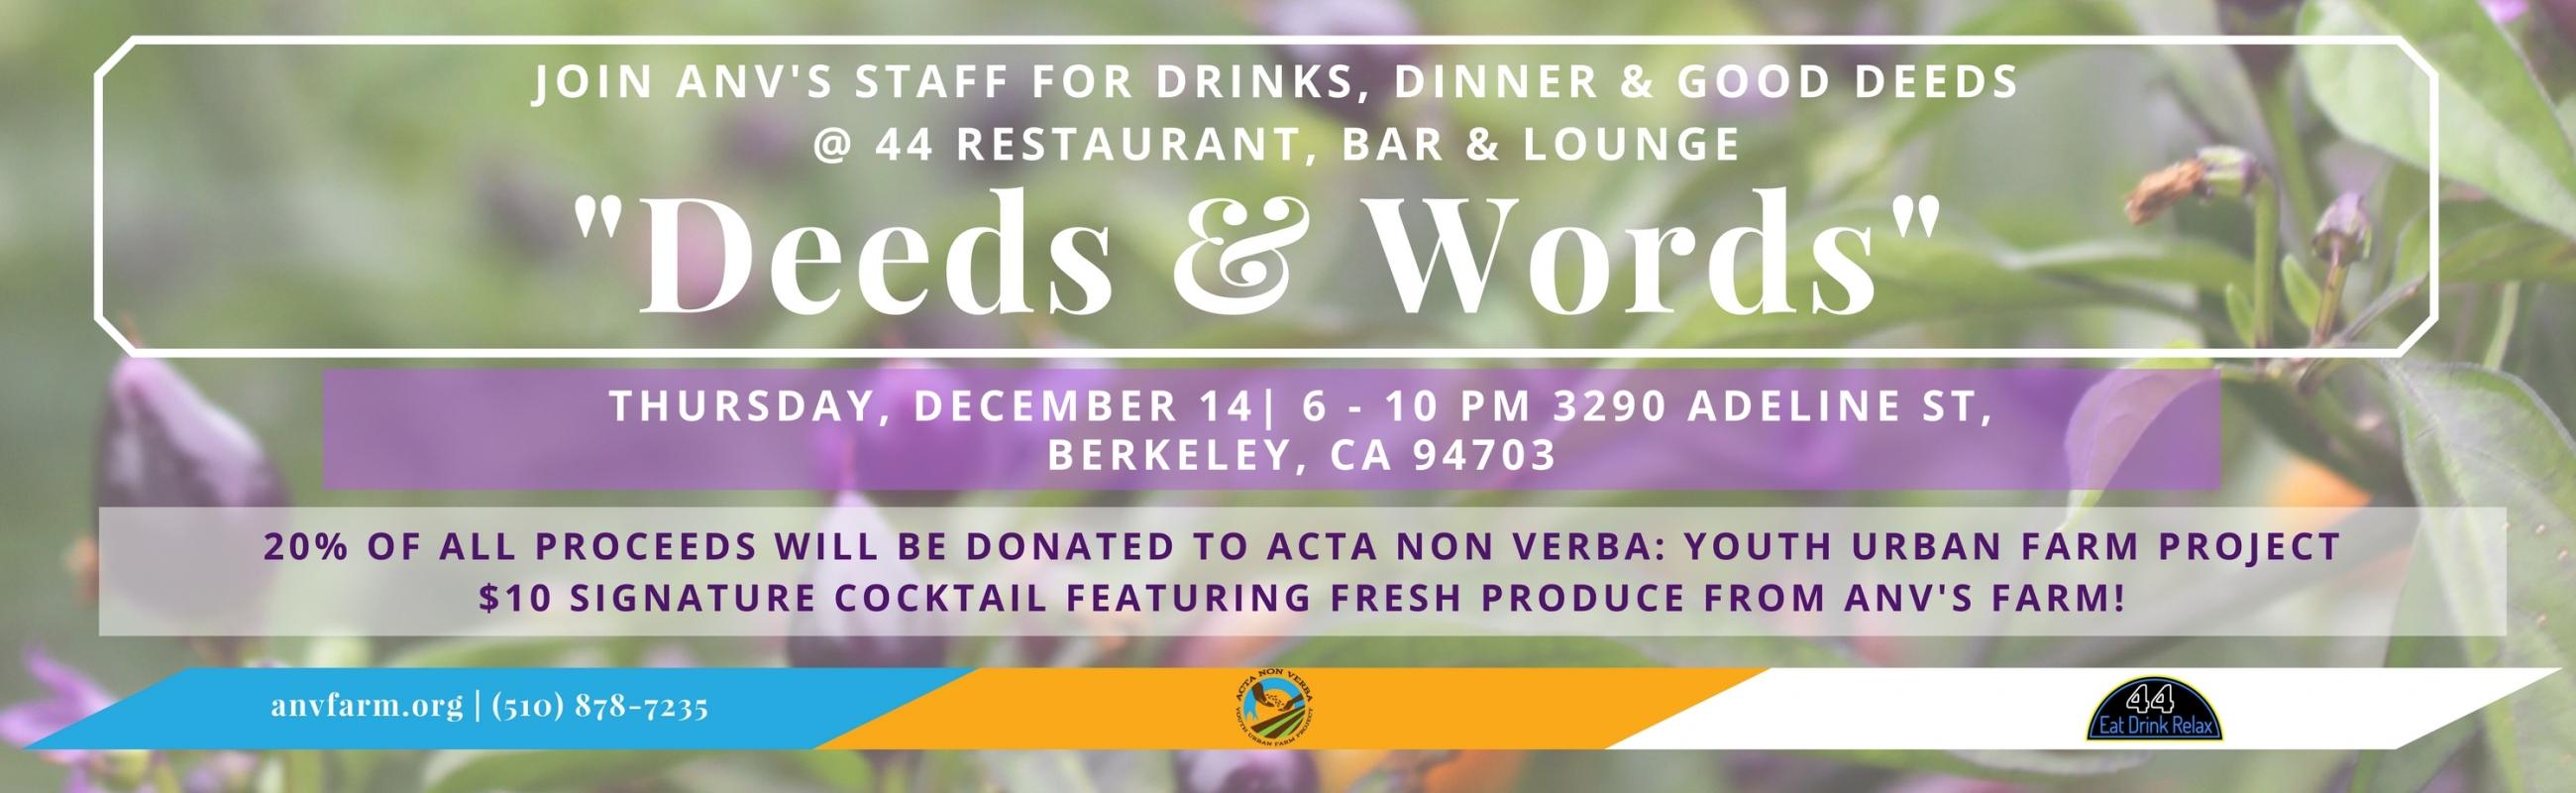 Dec. 14 Event Web Banner (1)